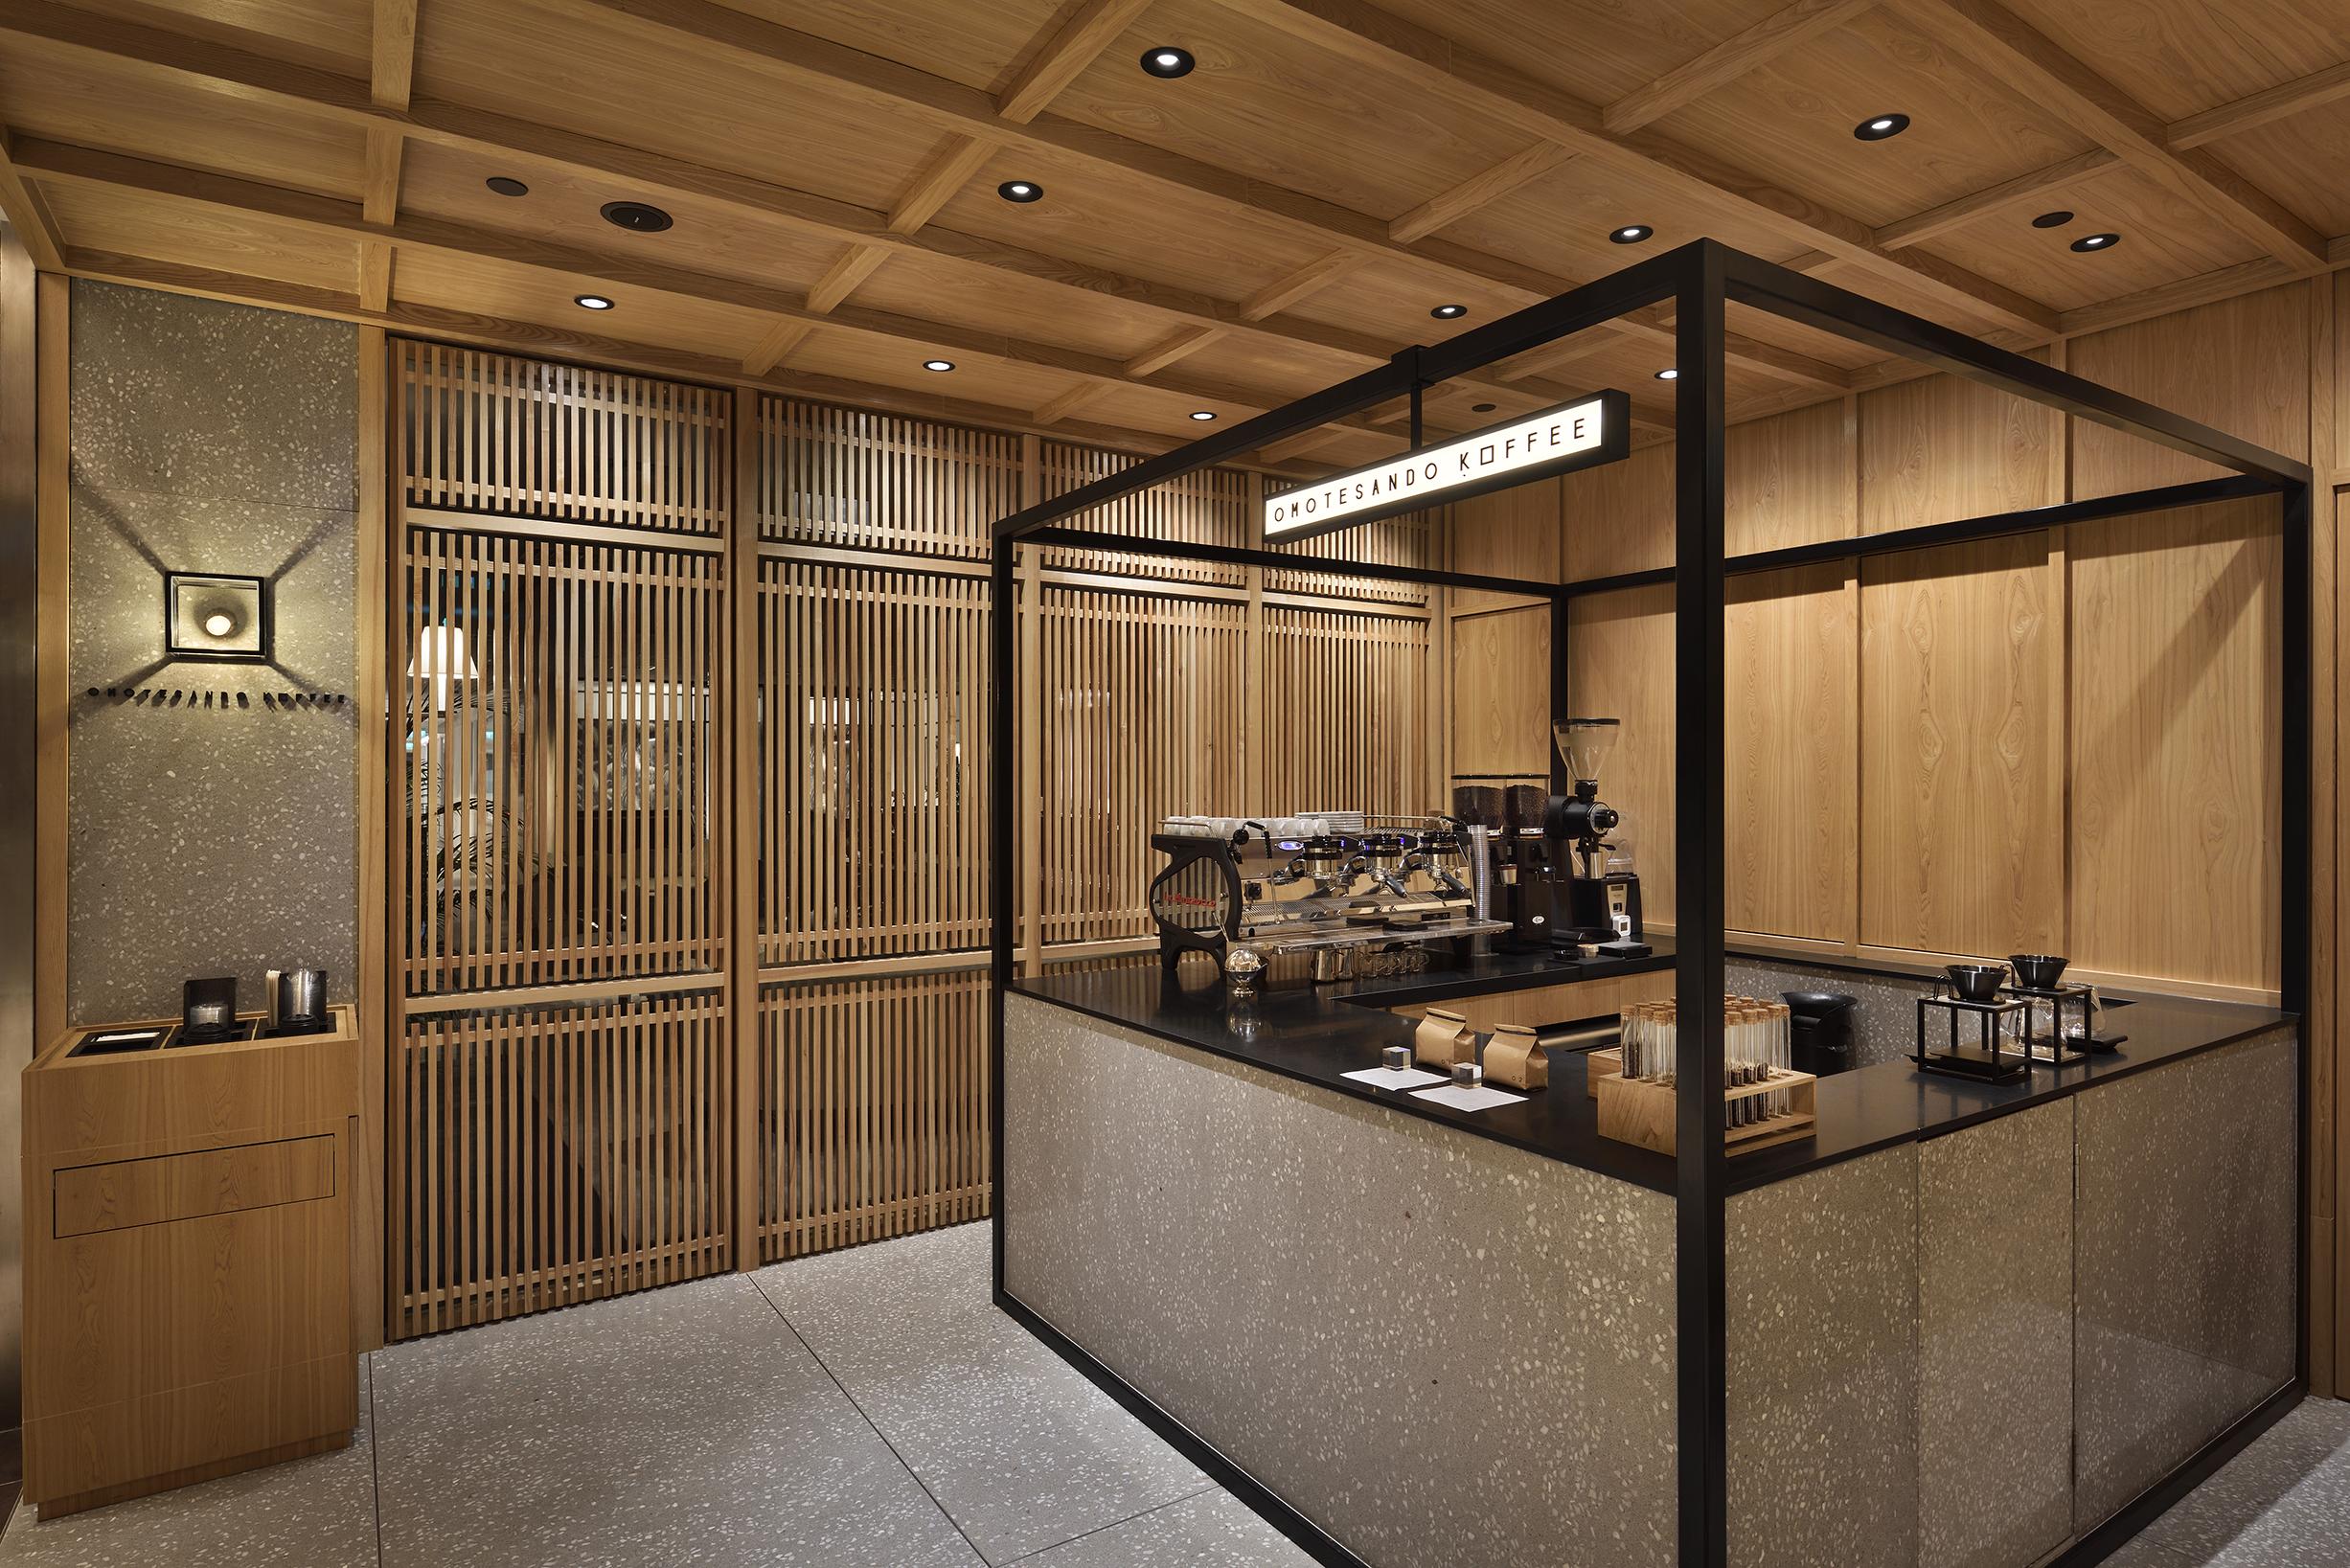 OMOTESANDO KOFFEE SINGAPORE